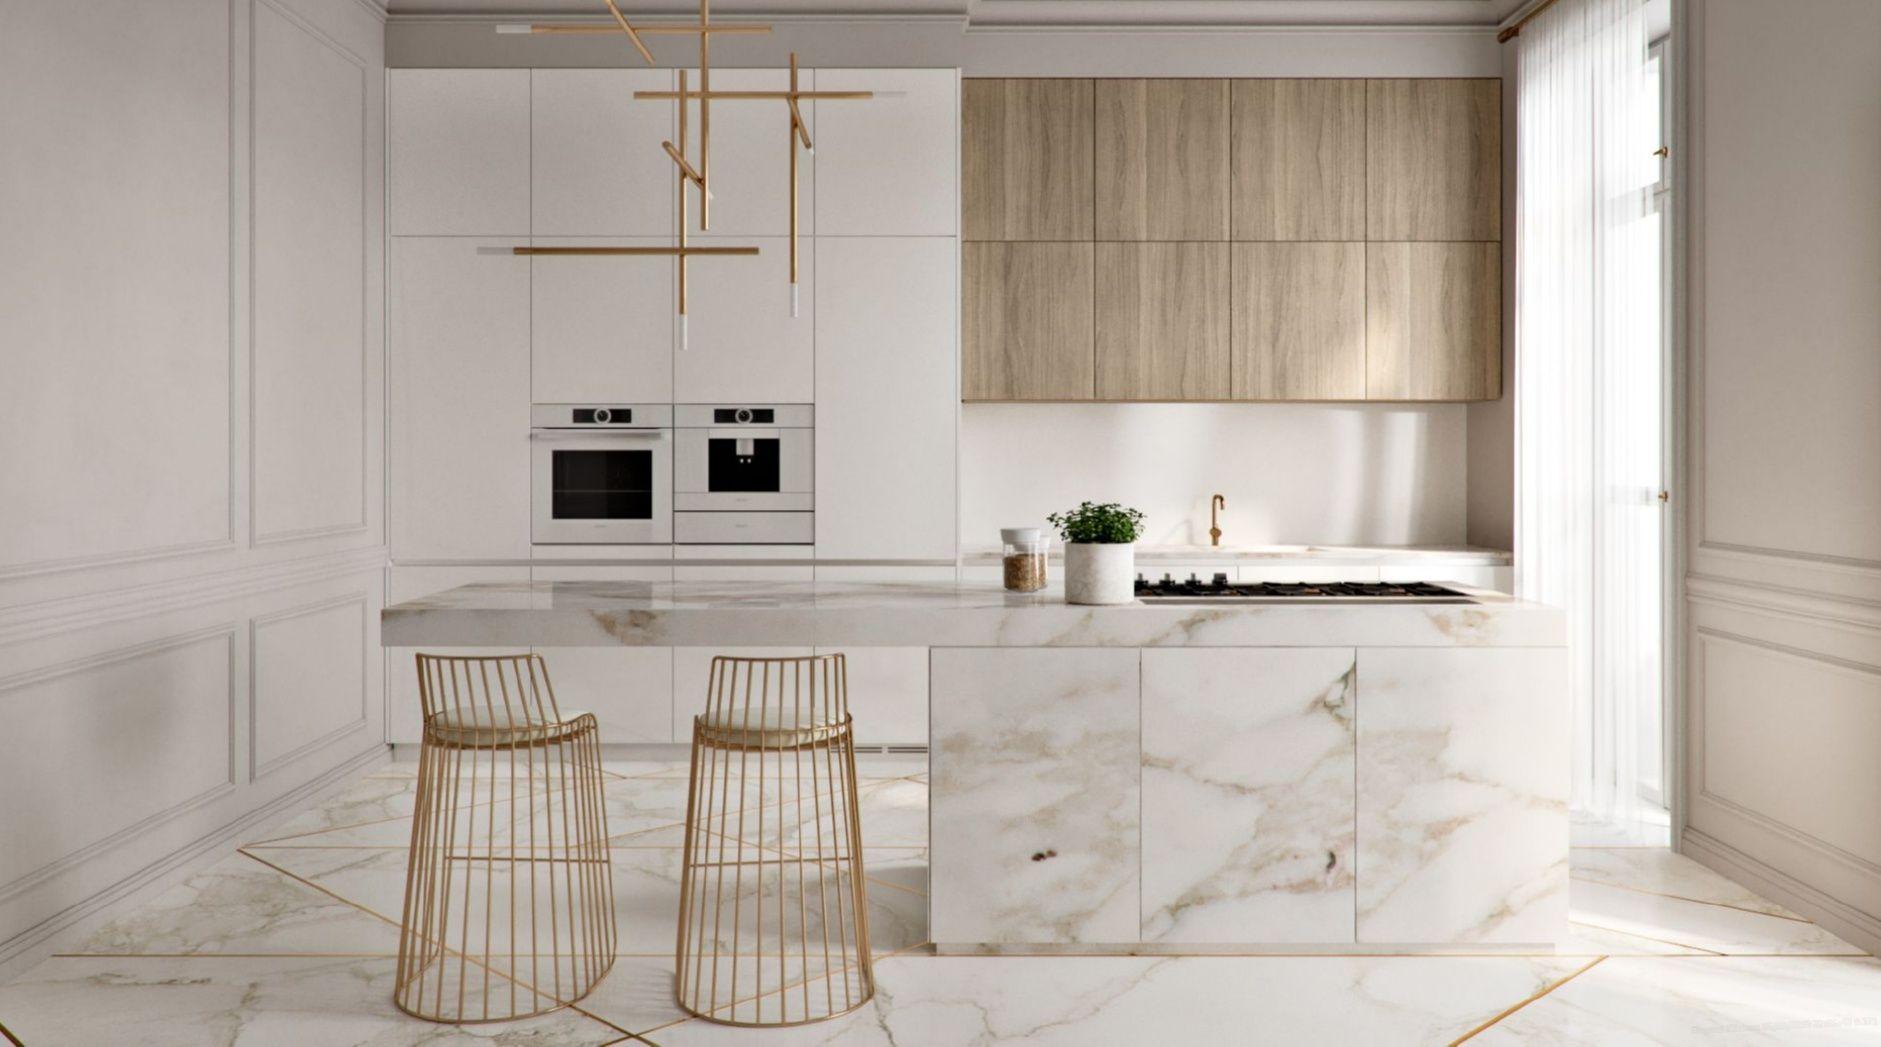 Beautiful Kitchen Design Ideas Gold Mramor Floor White Kitchen Beautifulkitchendes Elegant Kitchens Kitchen Interior Design Modern Modern Kitchen Design